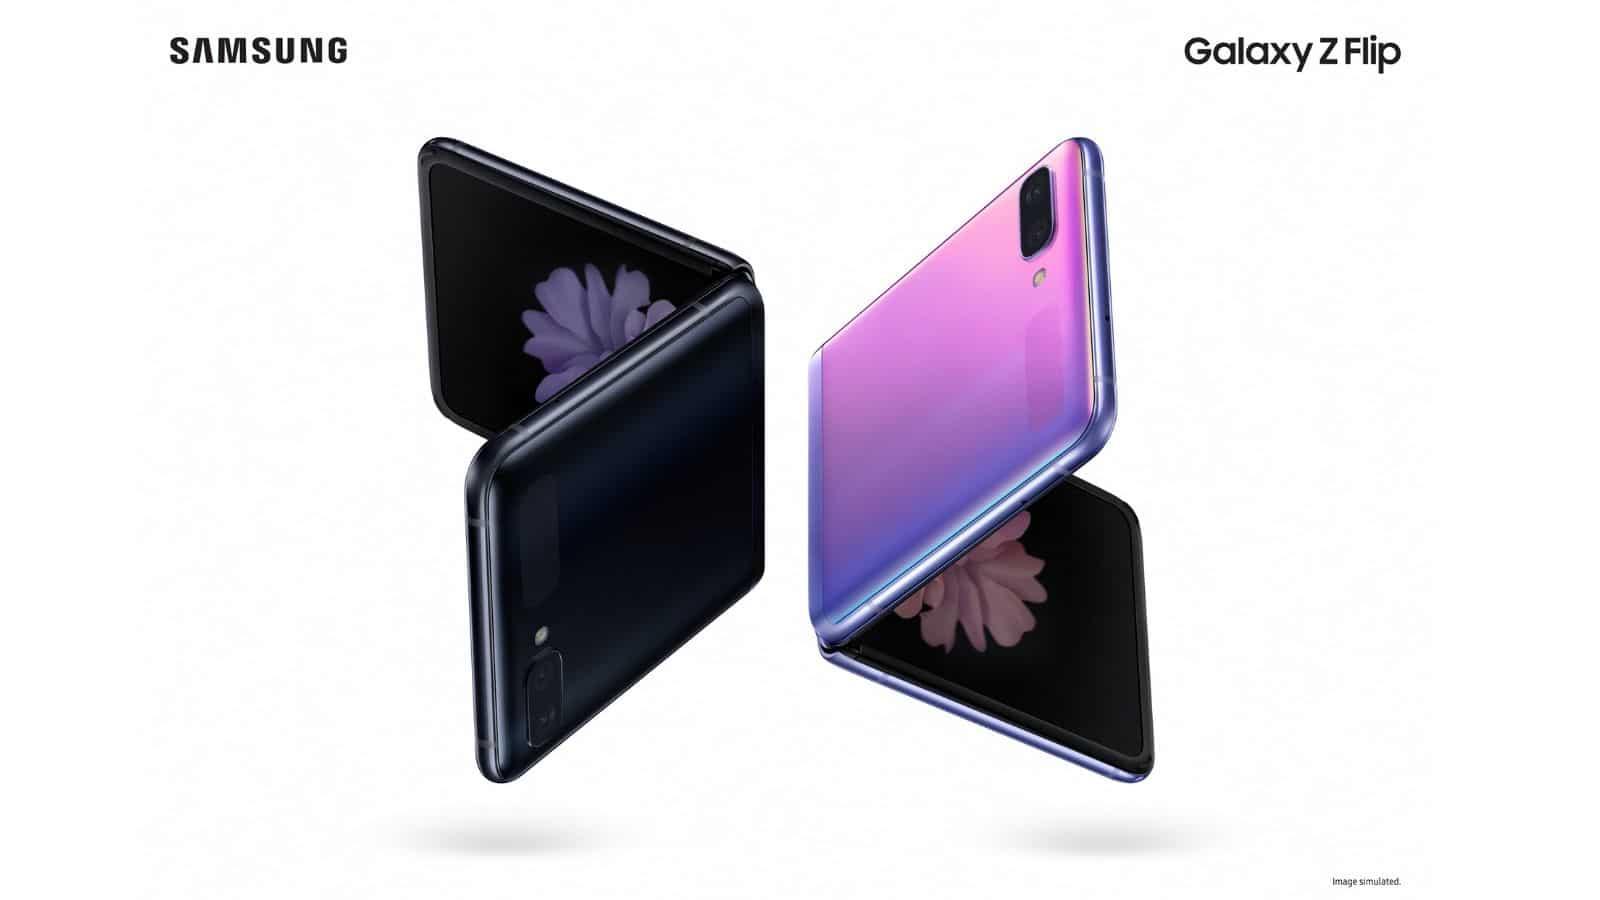 galaxy z flip phone on white background